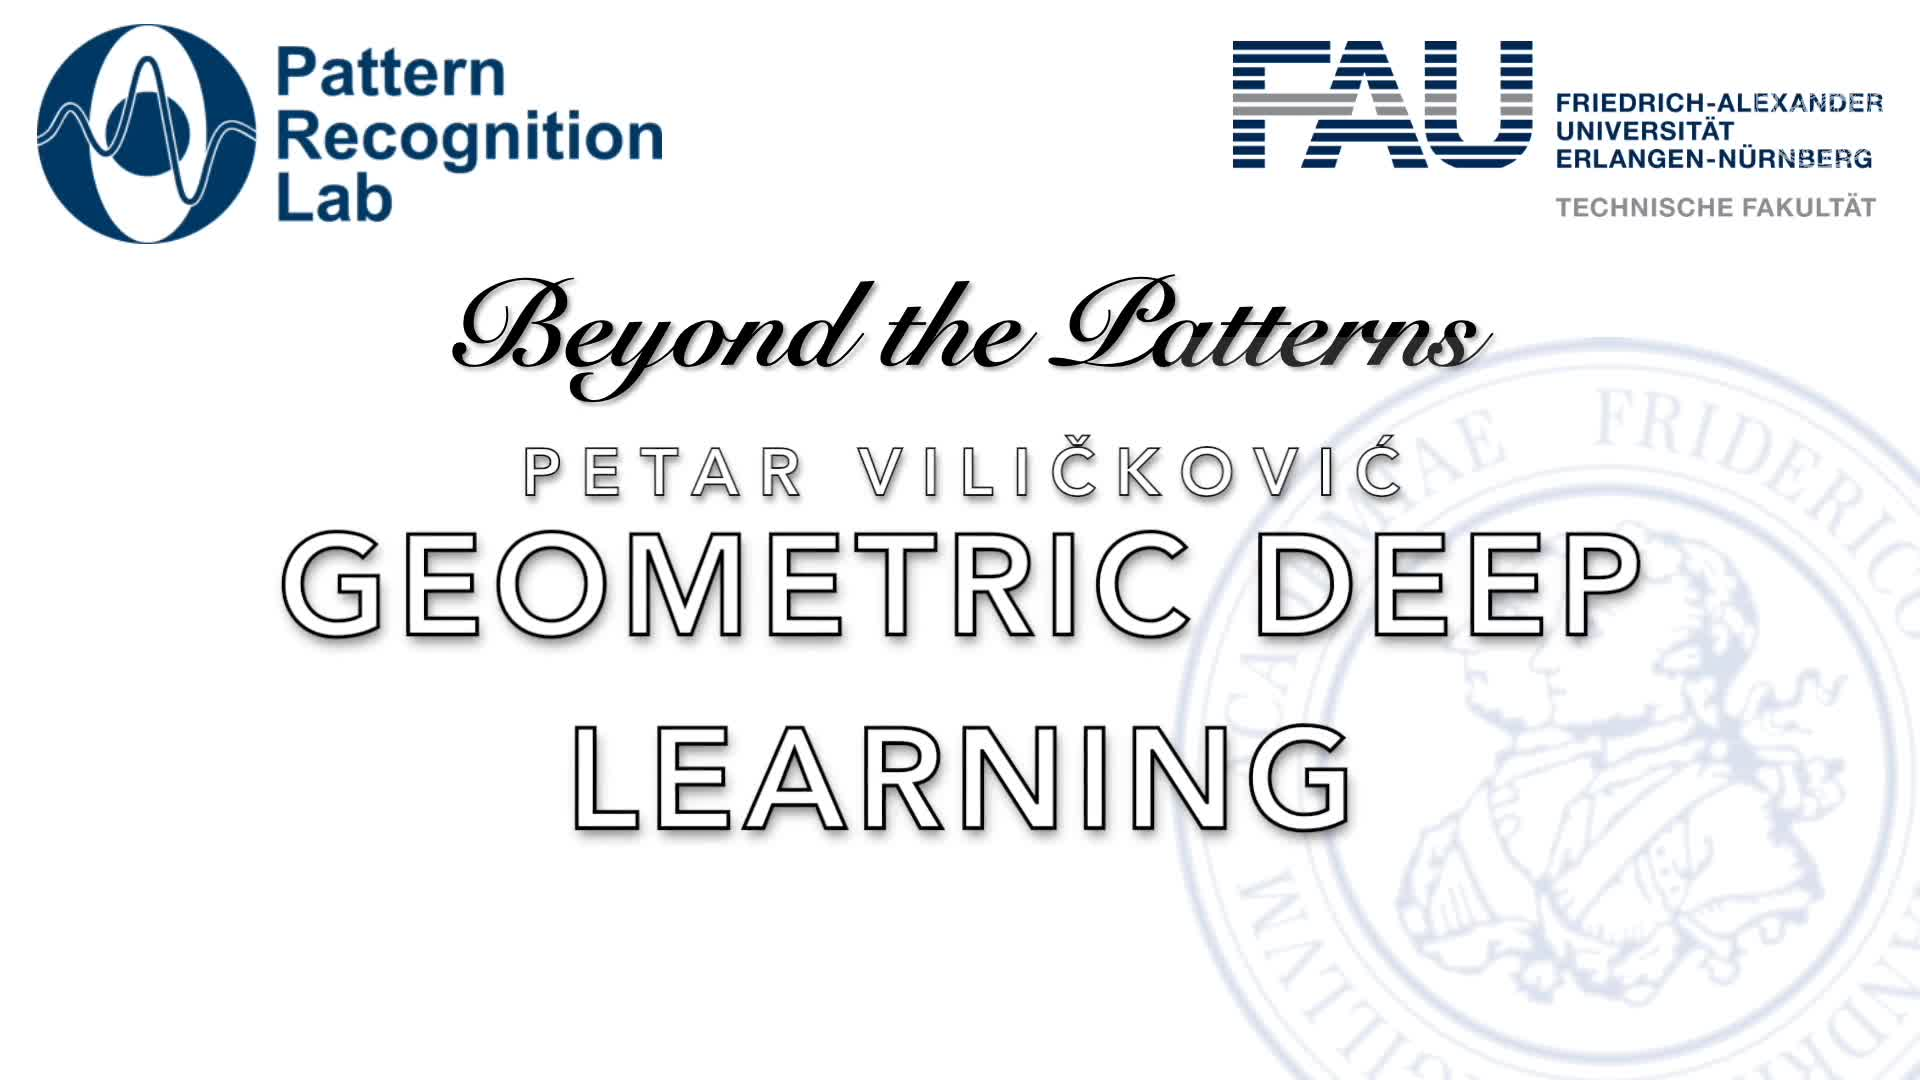 Beyond the Patterns - Petar Veličković - Geometric Deep Learning preview image